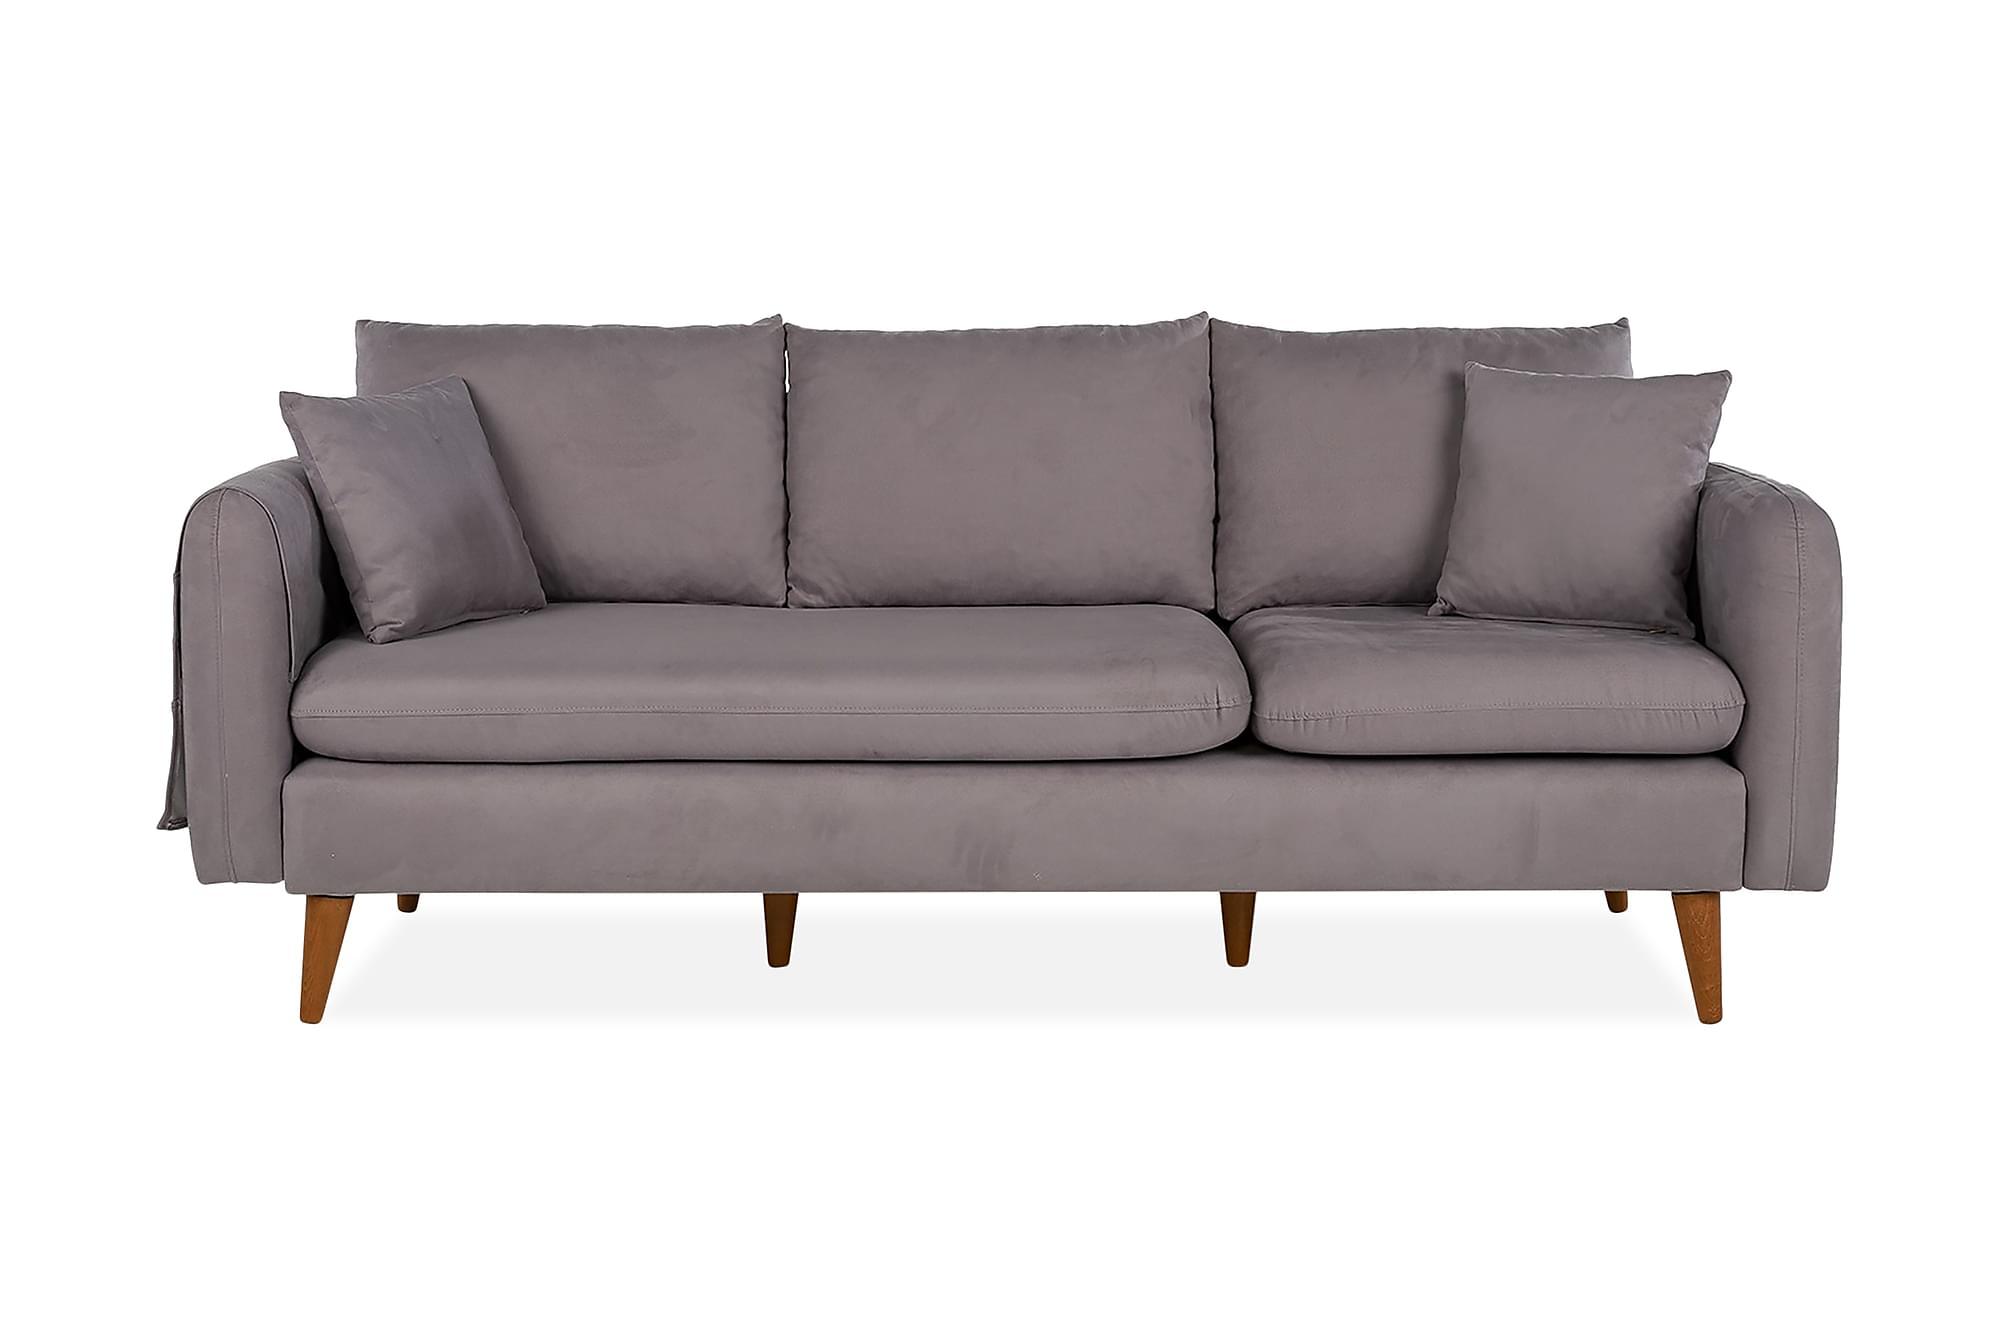 REECIE 3-sits Soffa Grå